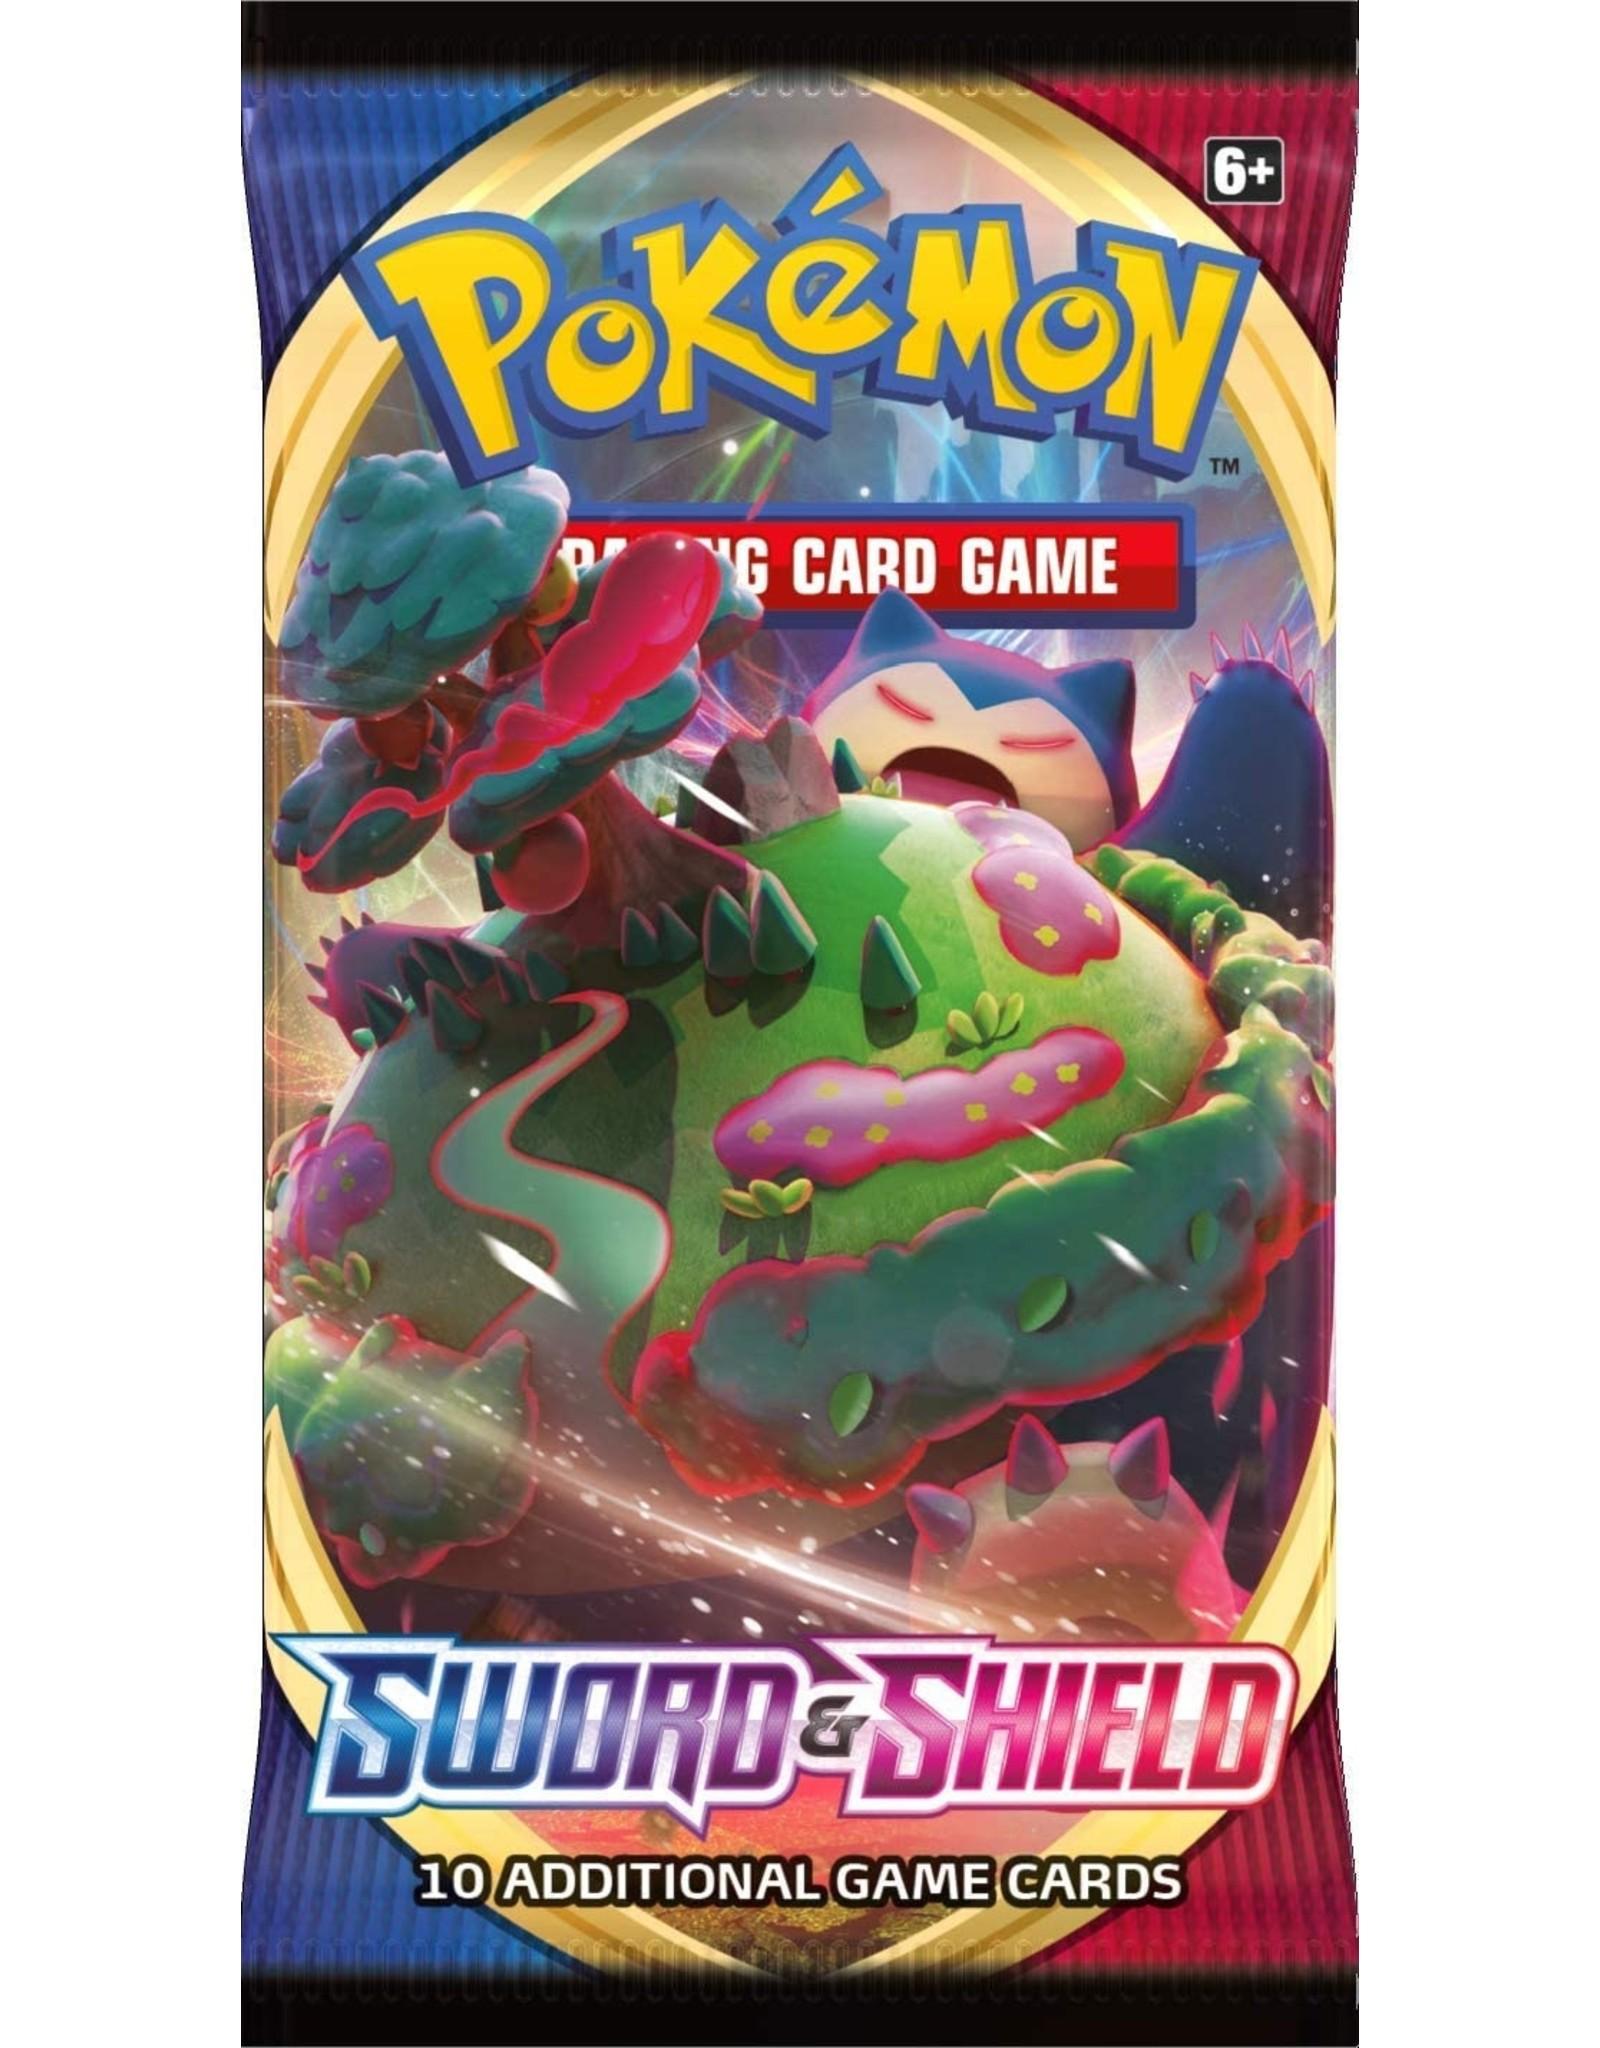 Pokemon PKM: Sword & Shield Booster Pack